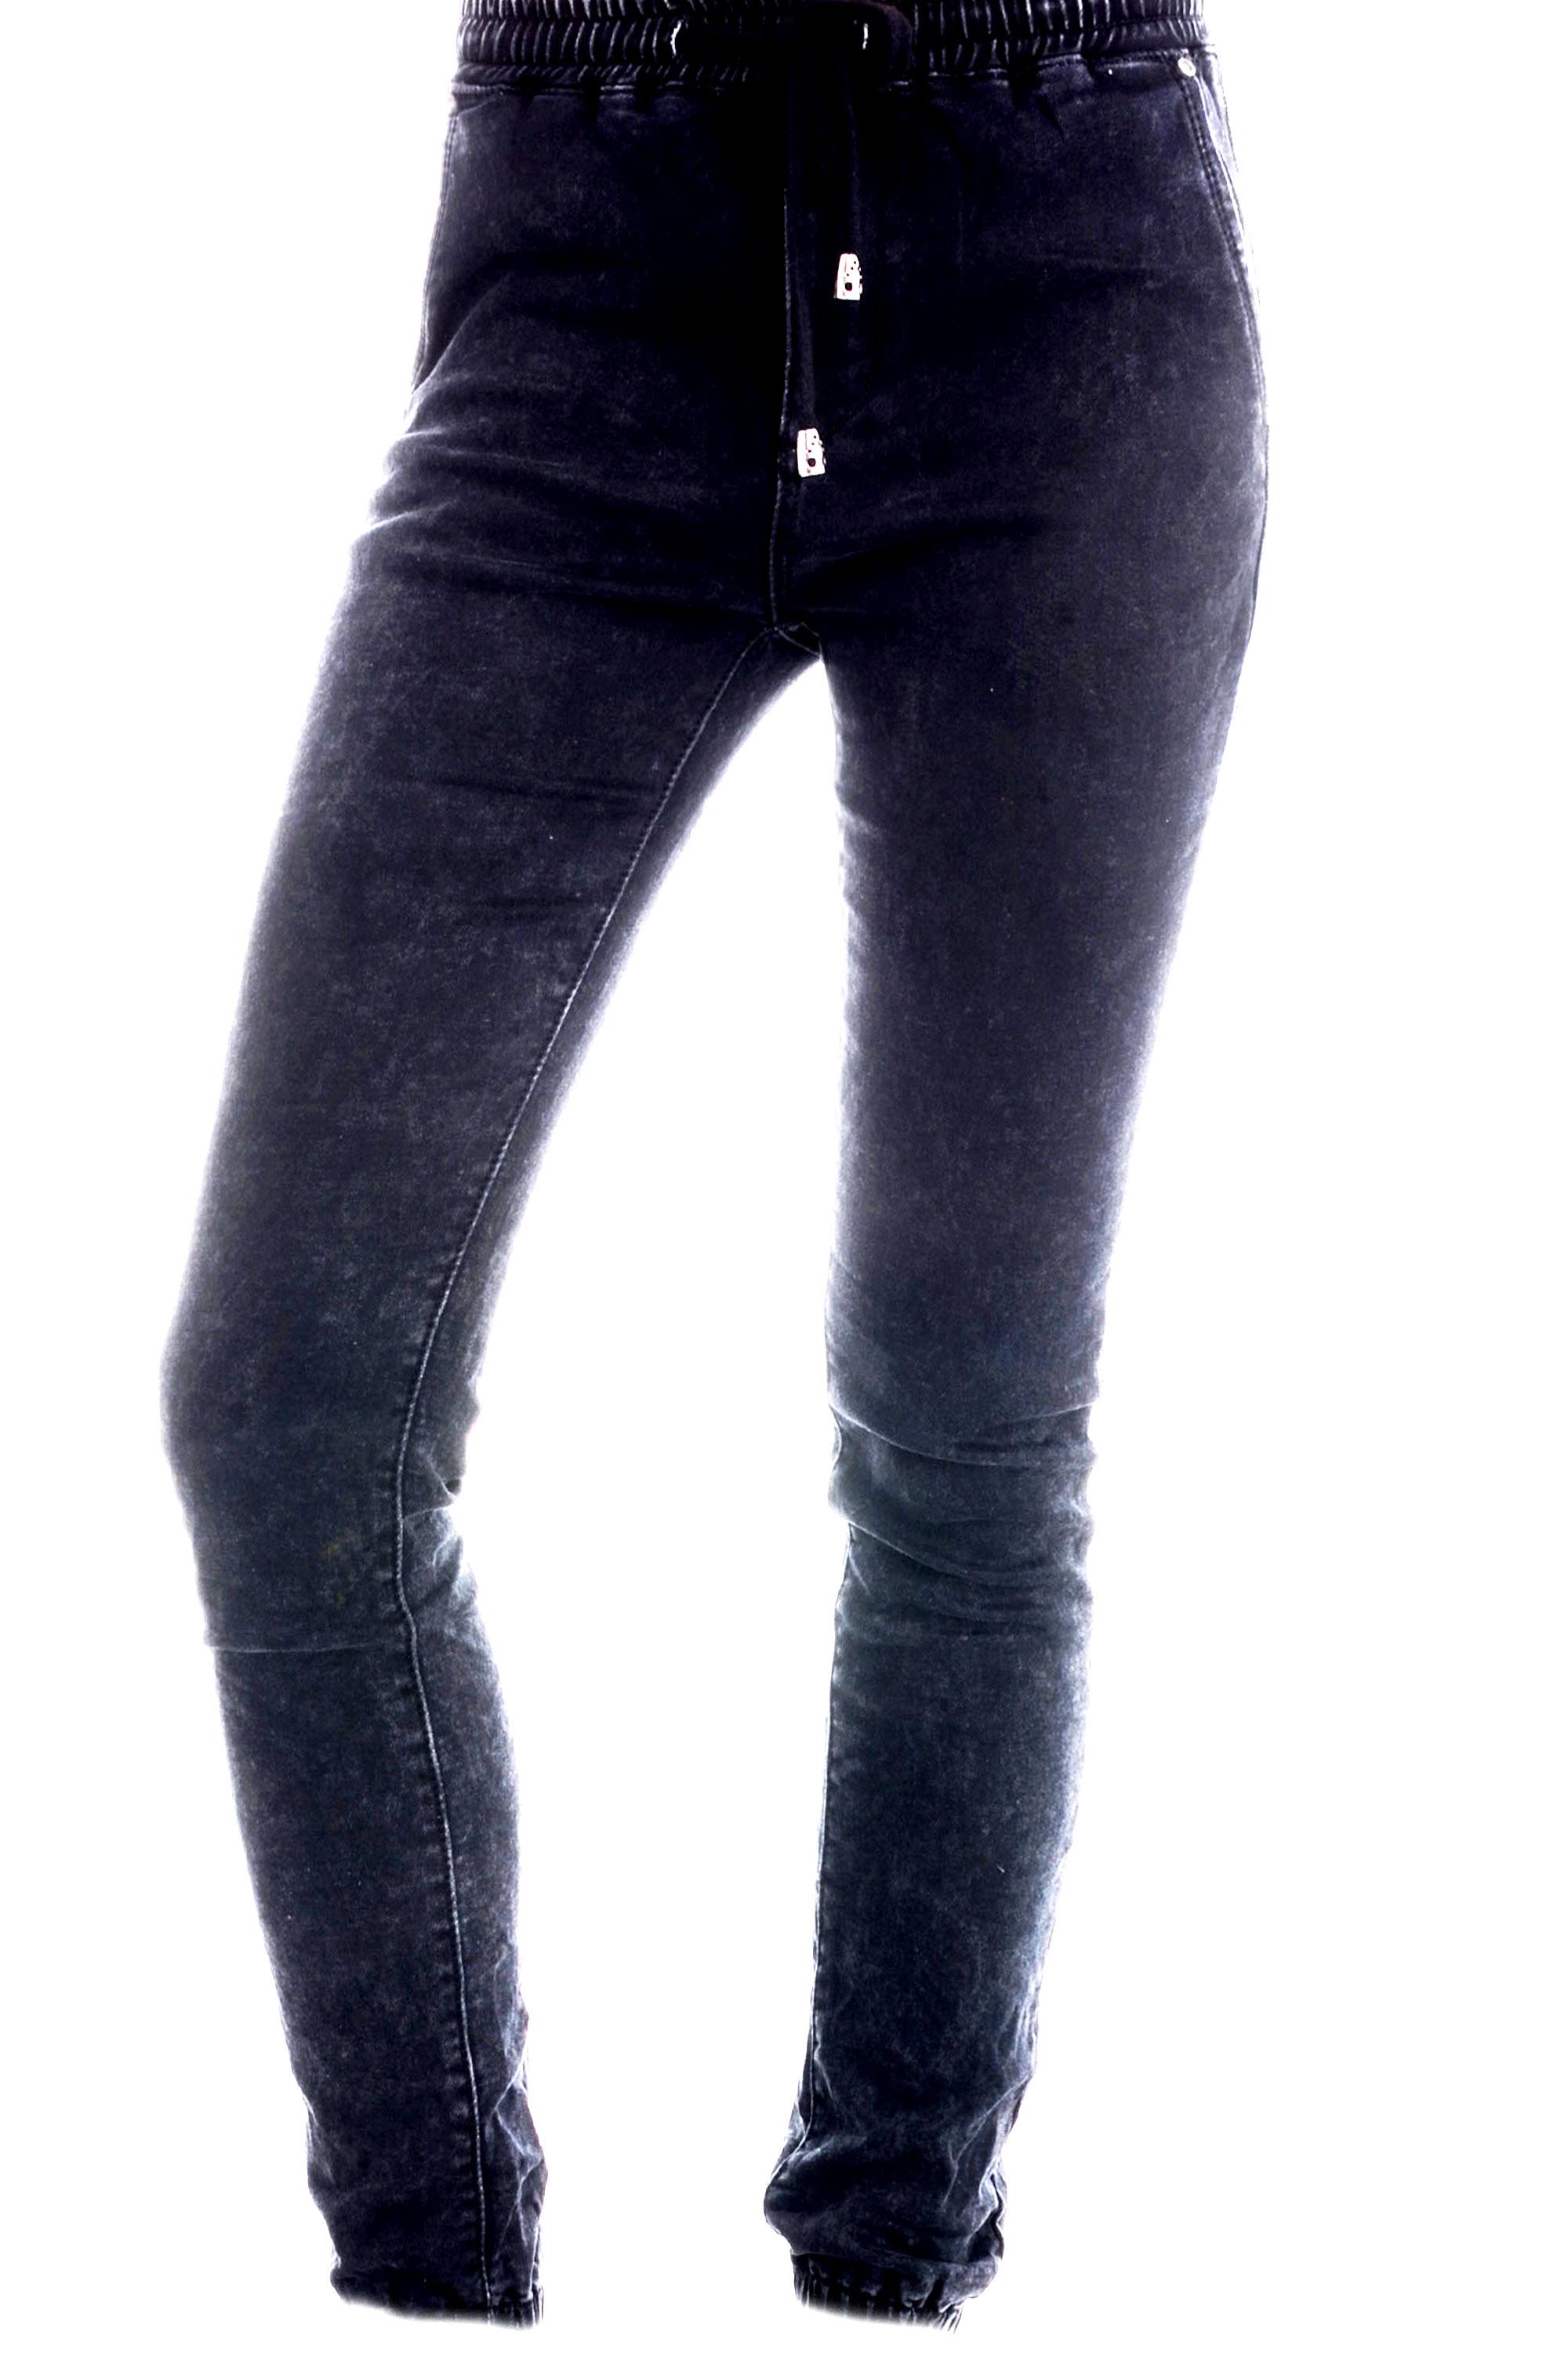 Spodnie - 130-2222 NERO - Unisono